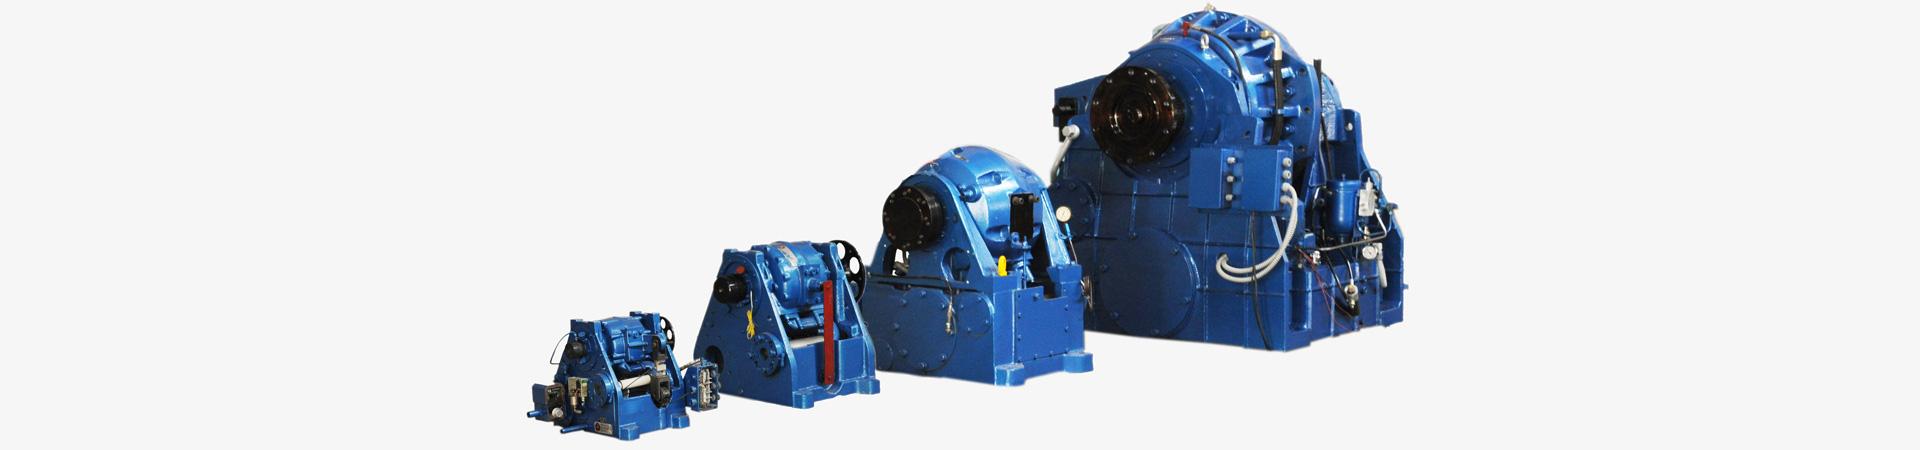 Pressure Controlled Hydraulic Dynamometers